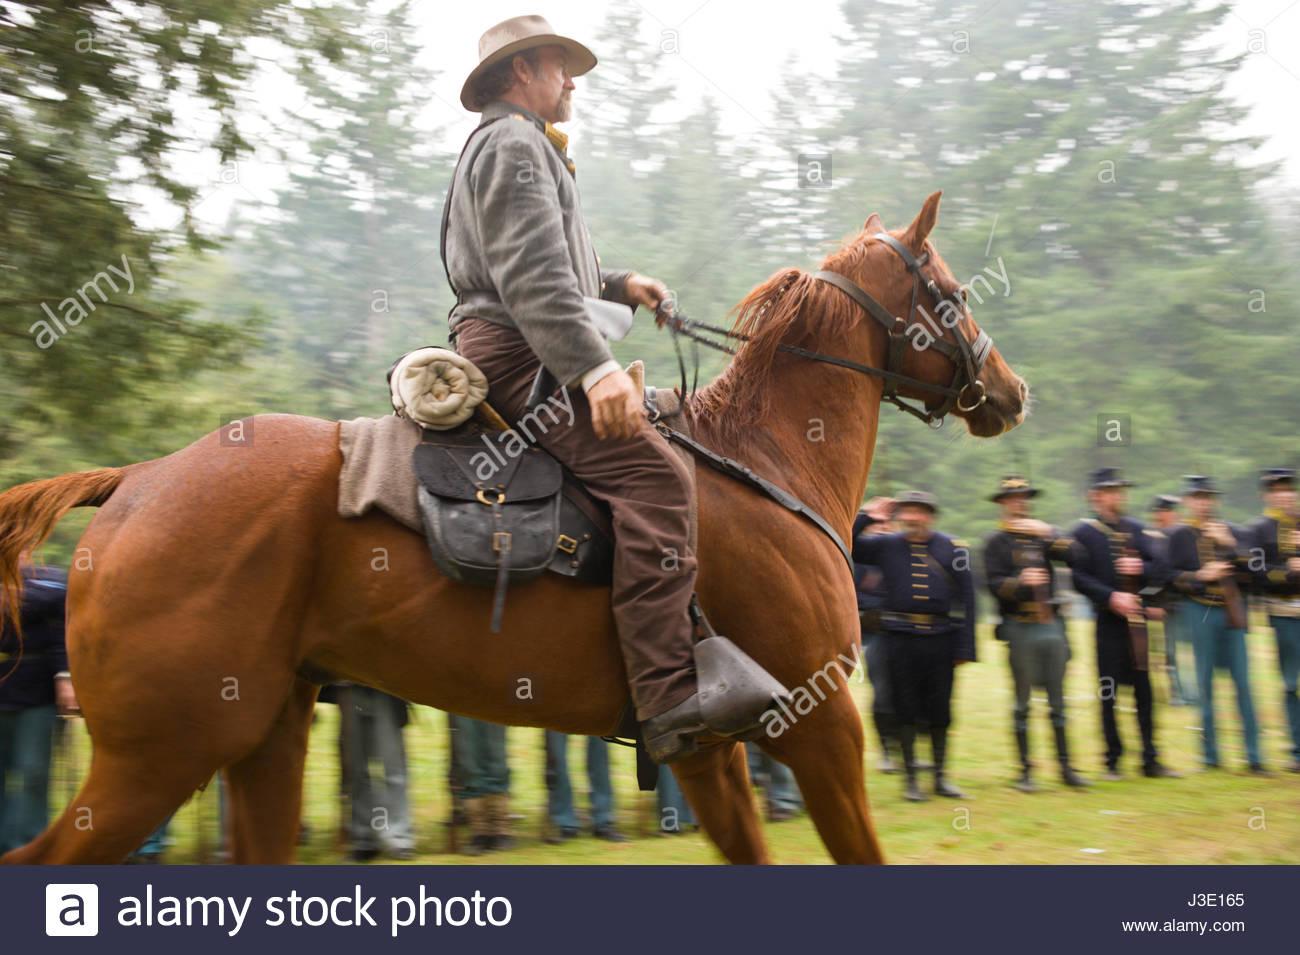 Confederate soldier on horseback at civil war reenactment milo mciver state park estacada